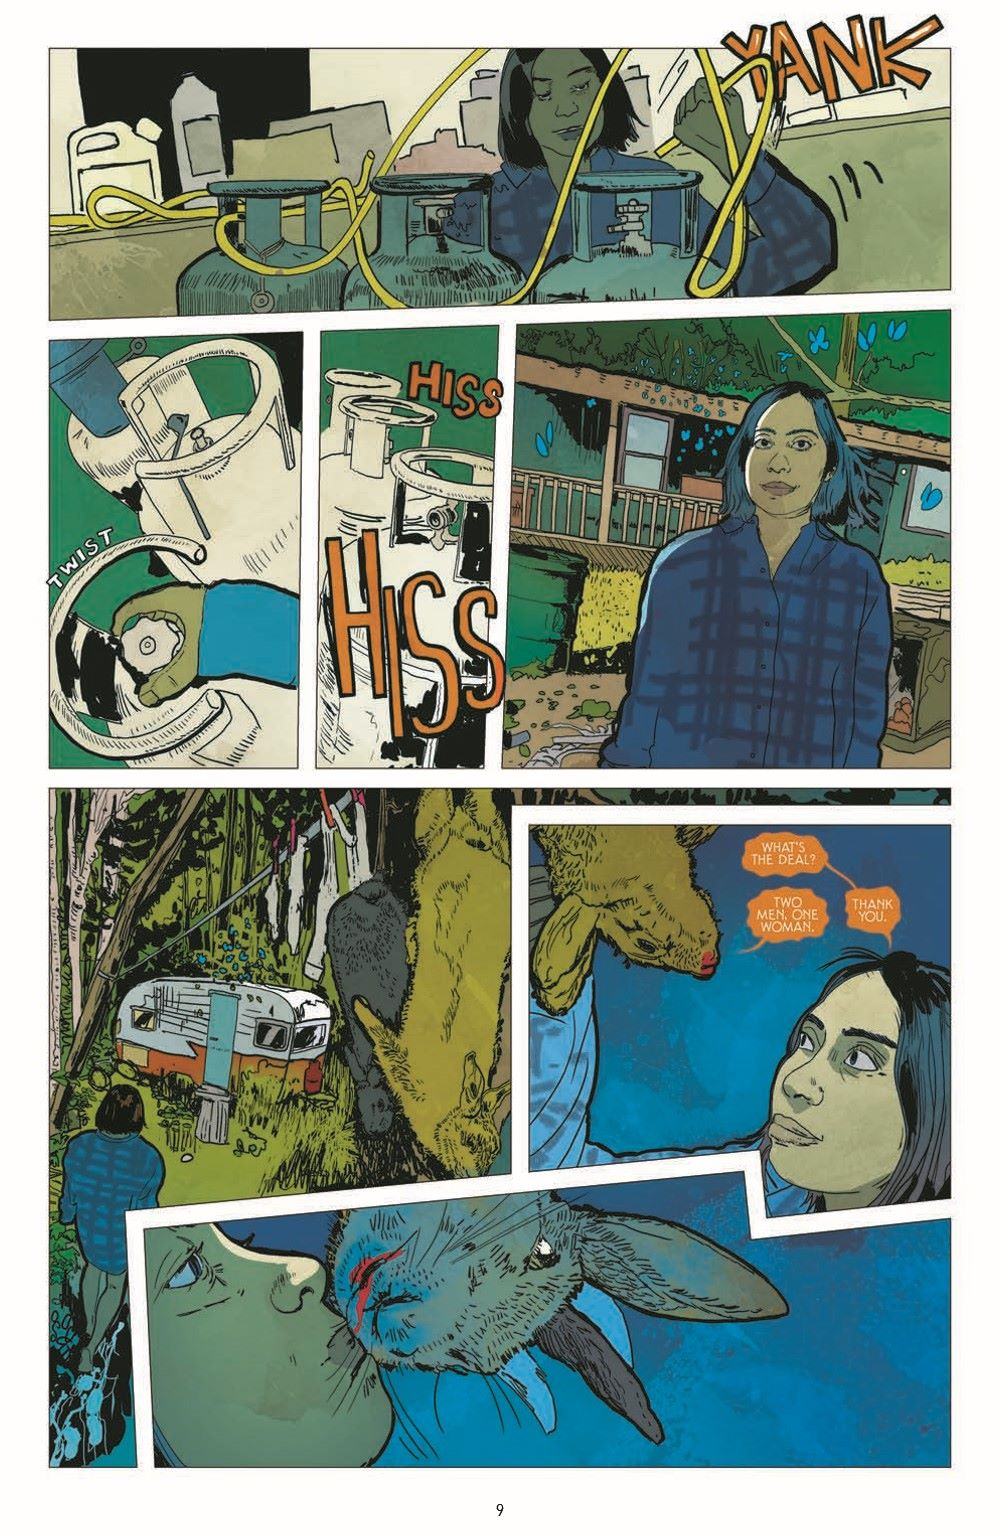 SleepingBeautiesHC_pr-8 ComicList Previews: SLEEPING BEAUTIES VOLUME 1 HC